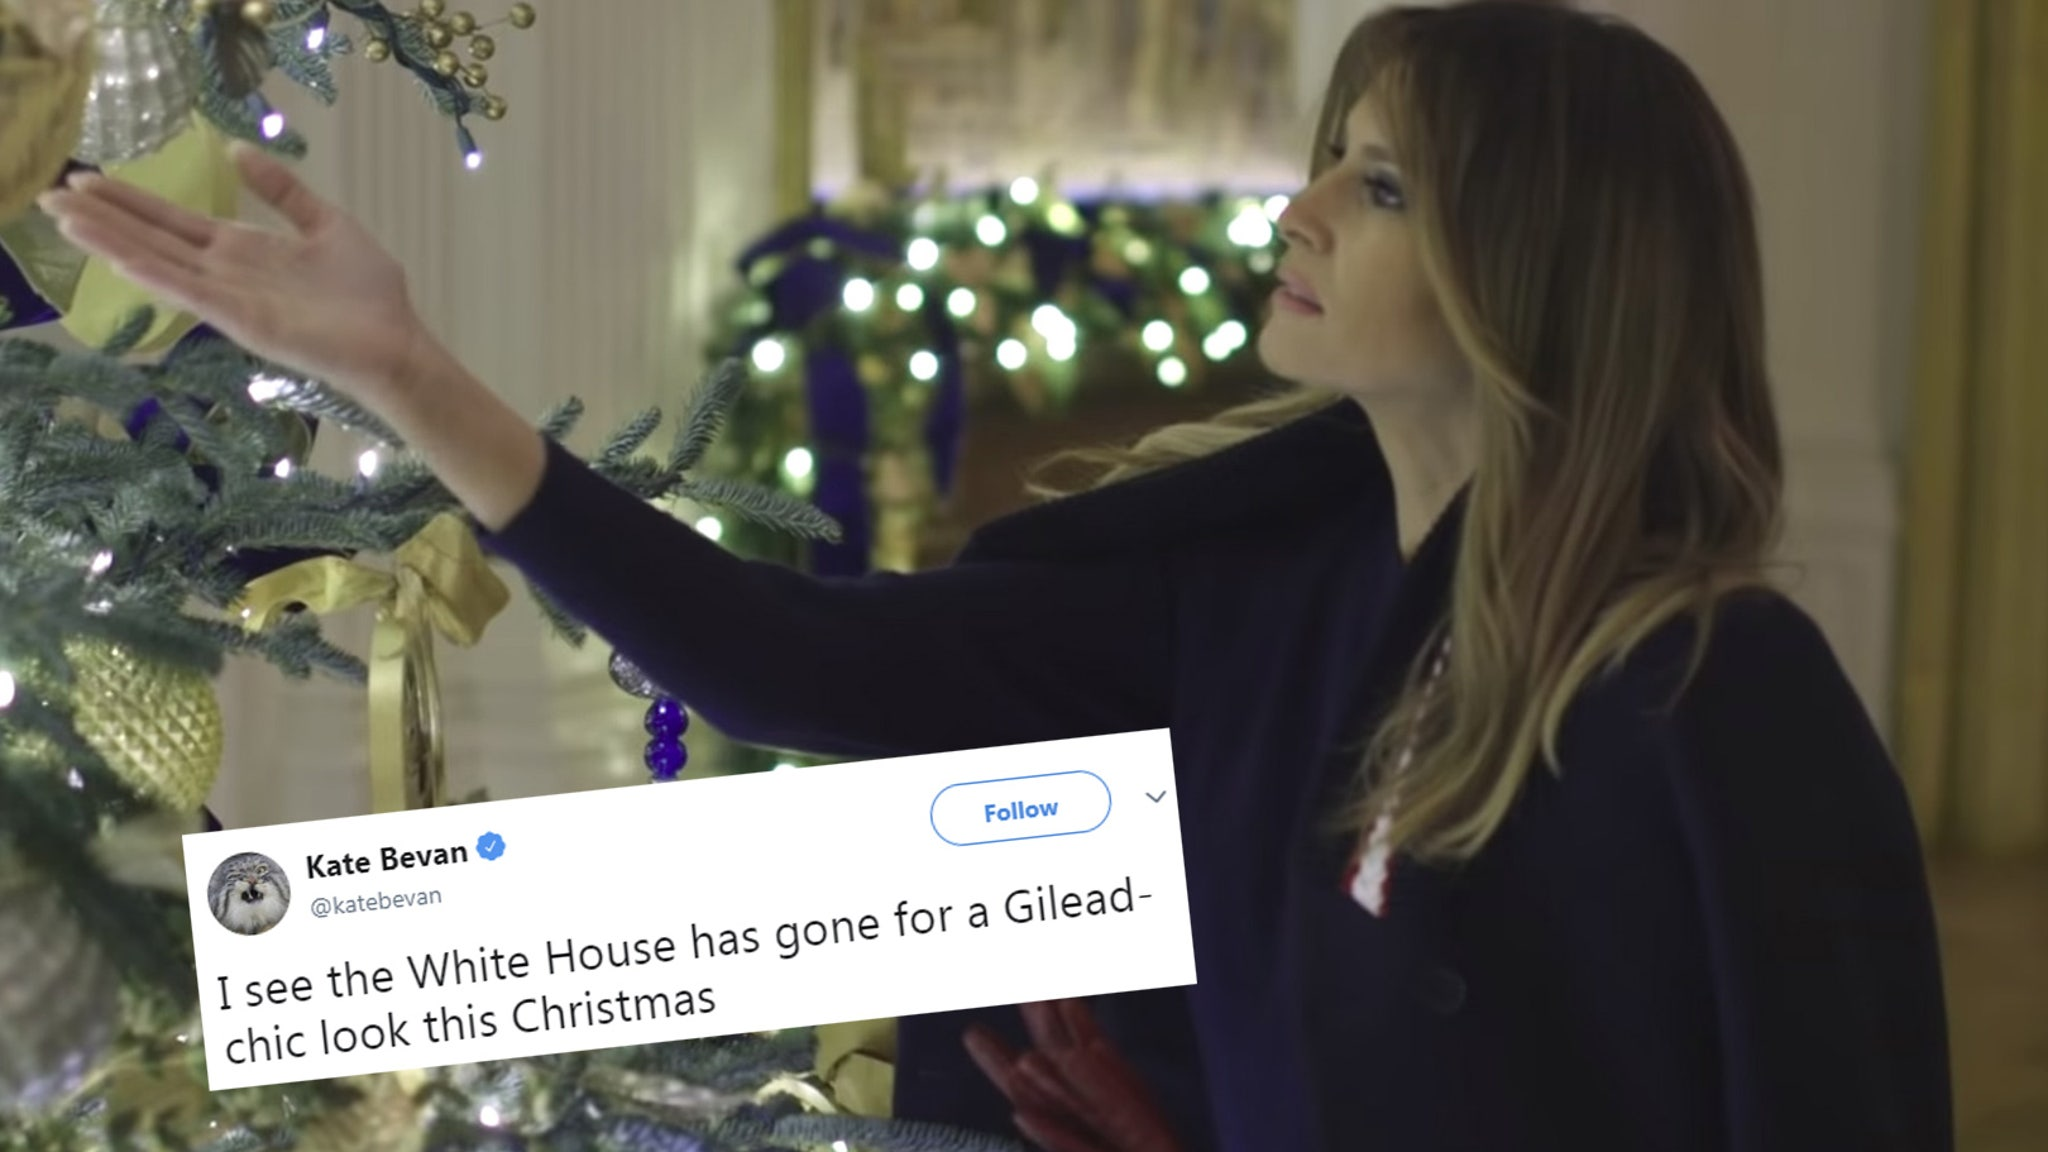 White House Red Christmas Trees Photoshop Twitter 2020 Melania Trump's White House Christmas Decor Draws Horror Movie